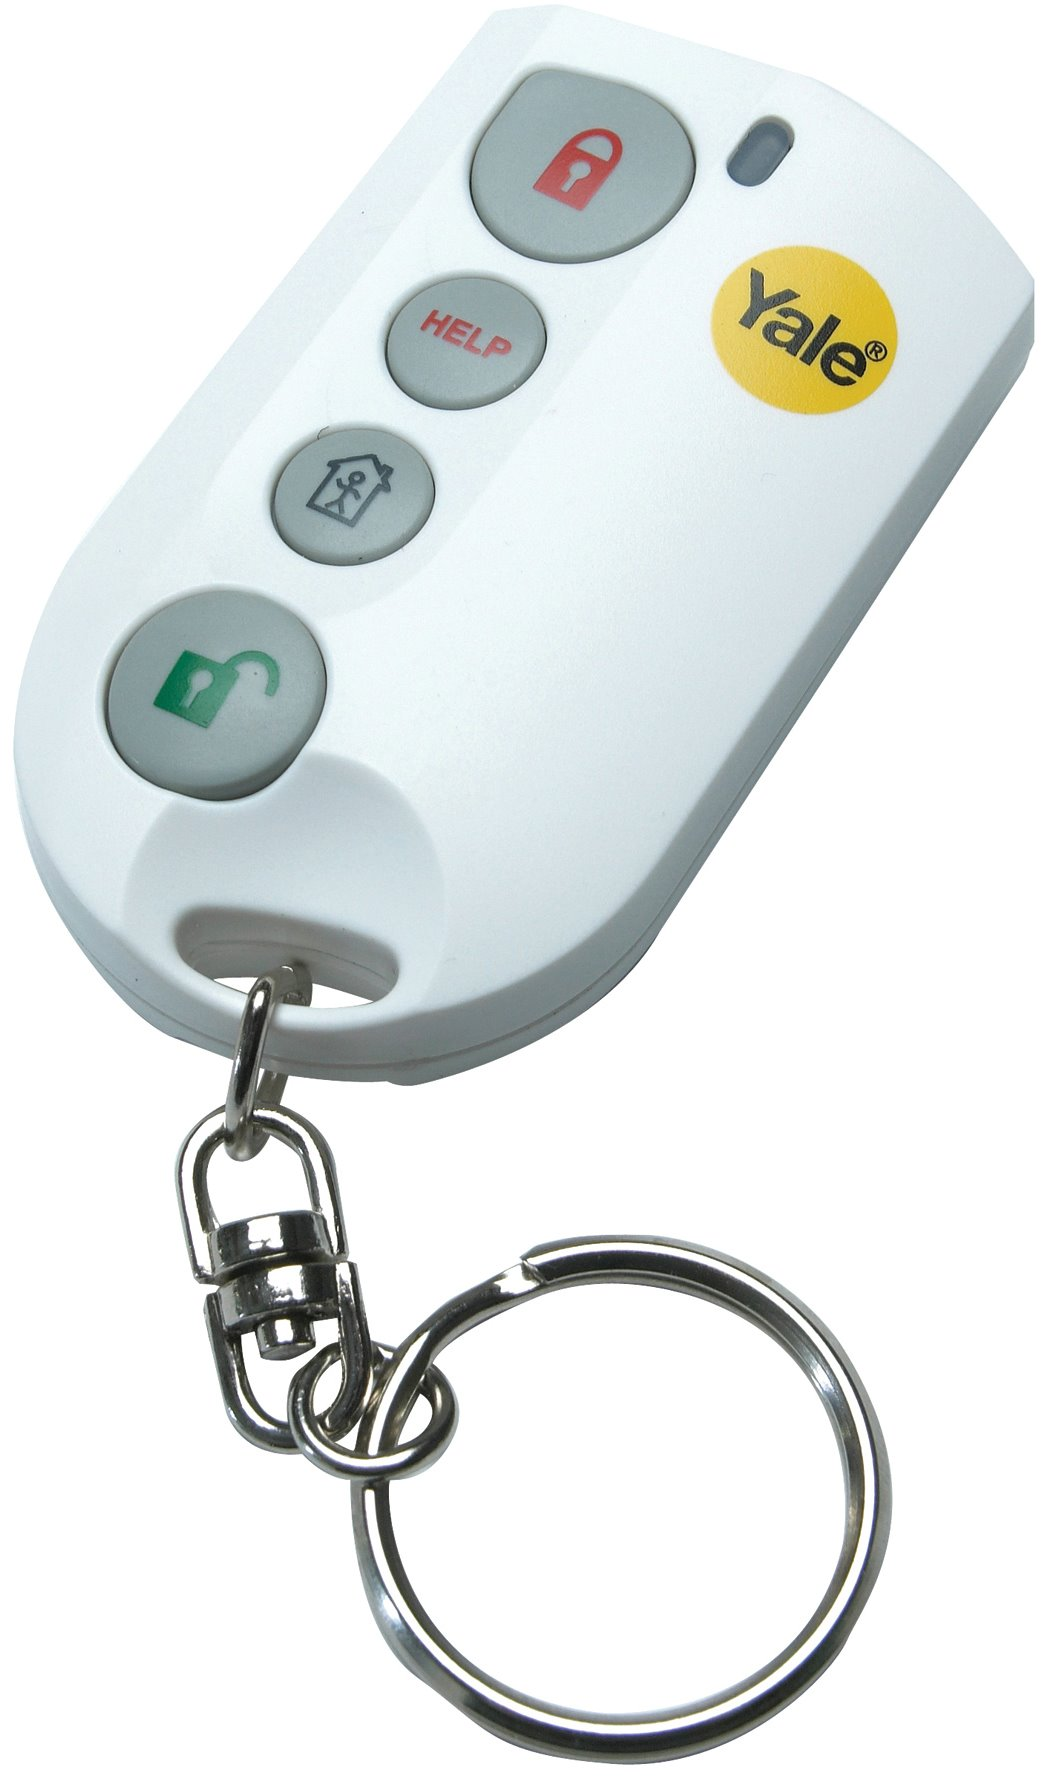 HSA6060 - Yale Alarm System Remote Control